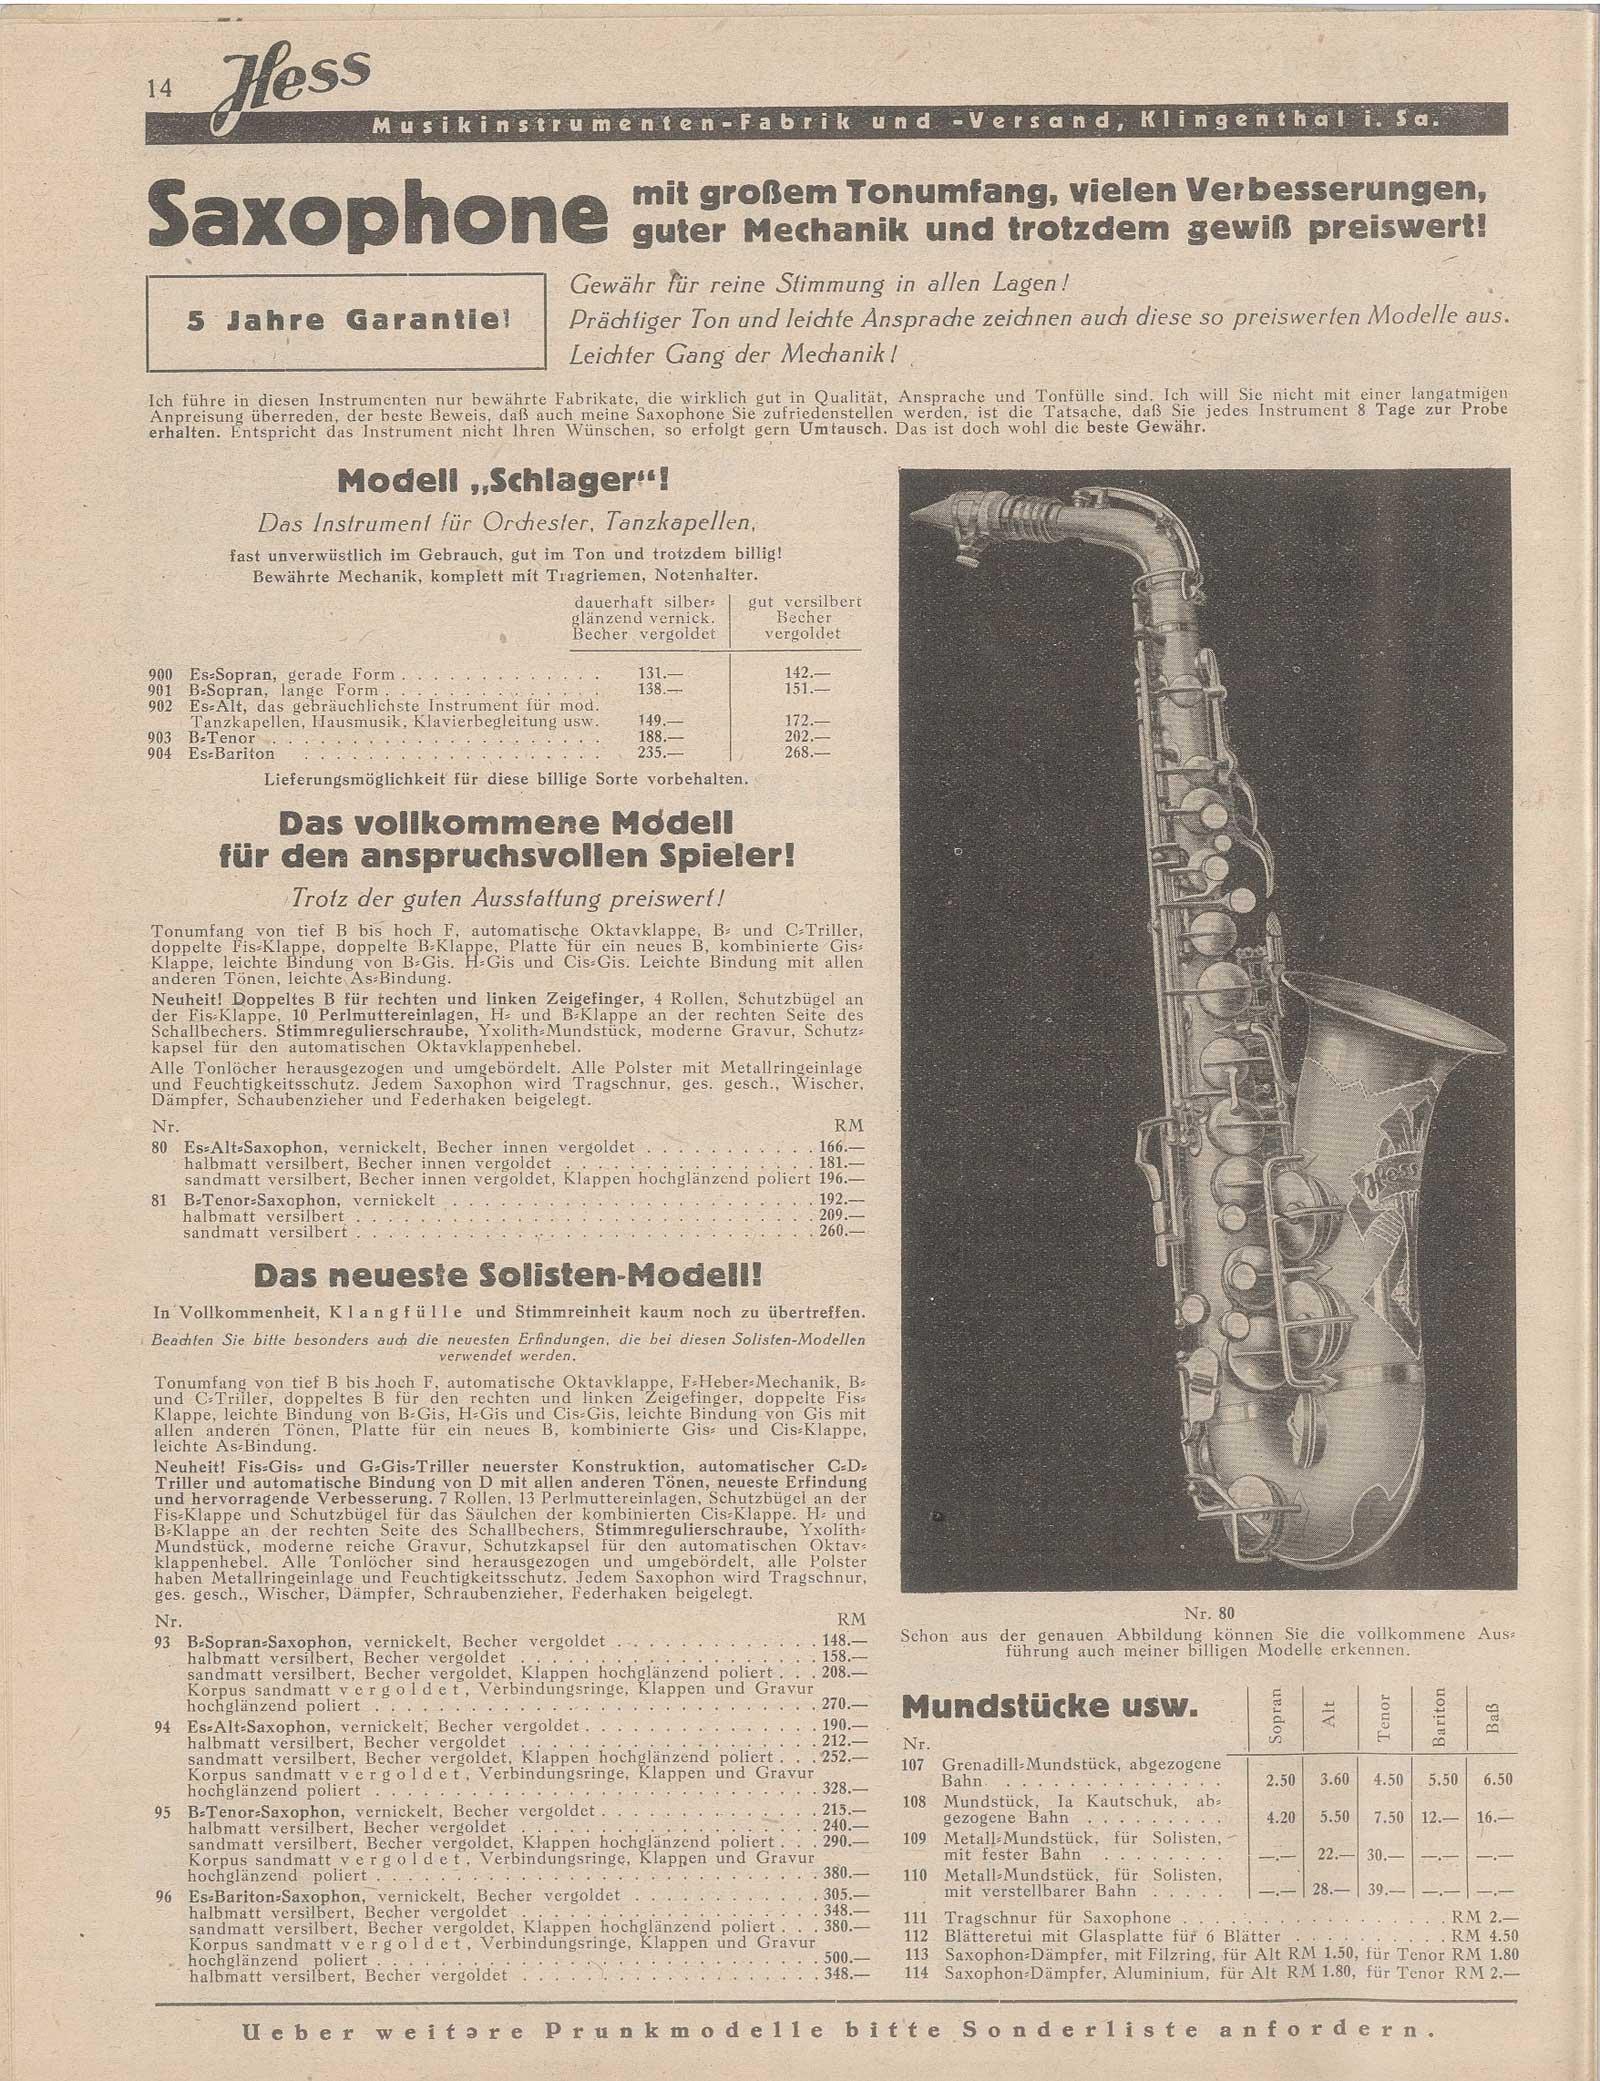 Klingenthal-era Hess saxophones, Ernst Hess, vintage musical instrument catalogue, 1940,  Graslitz, Klingenthal, Hess saxophone